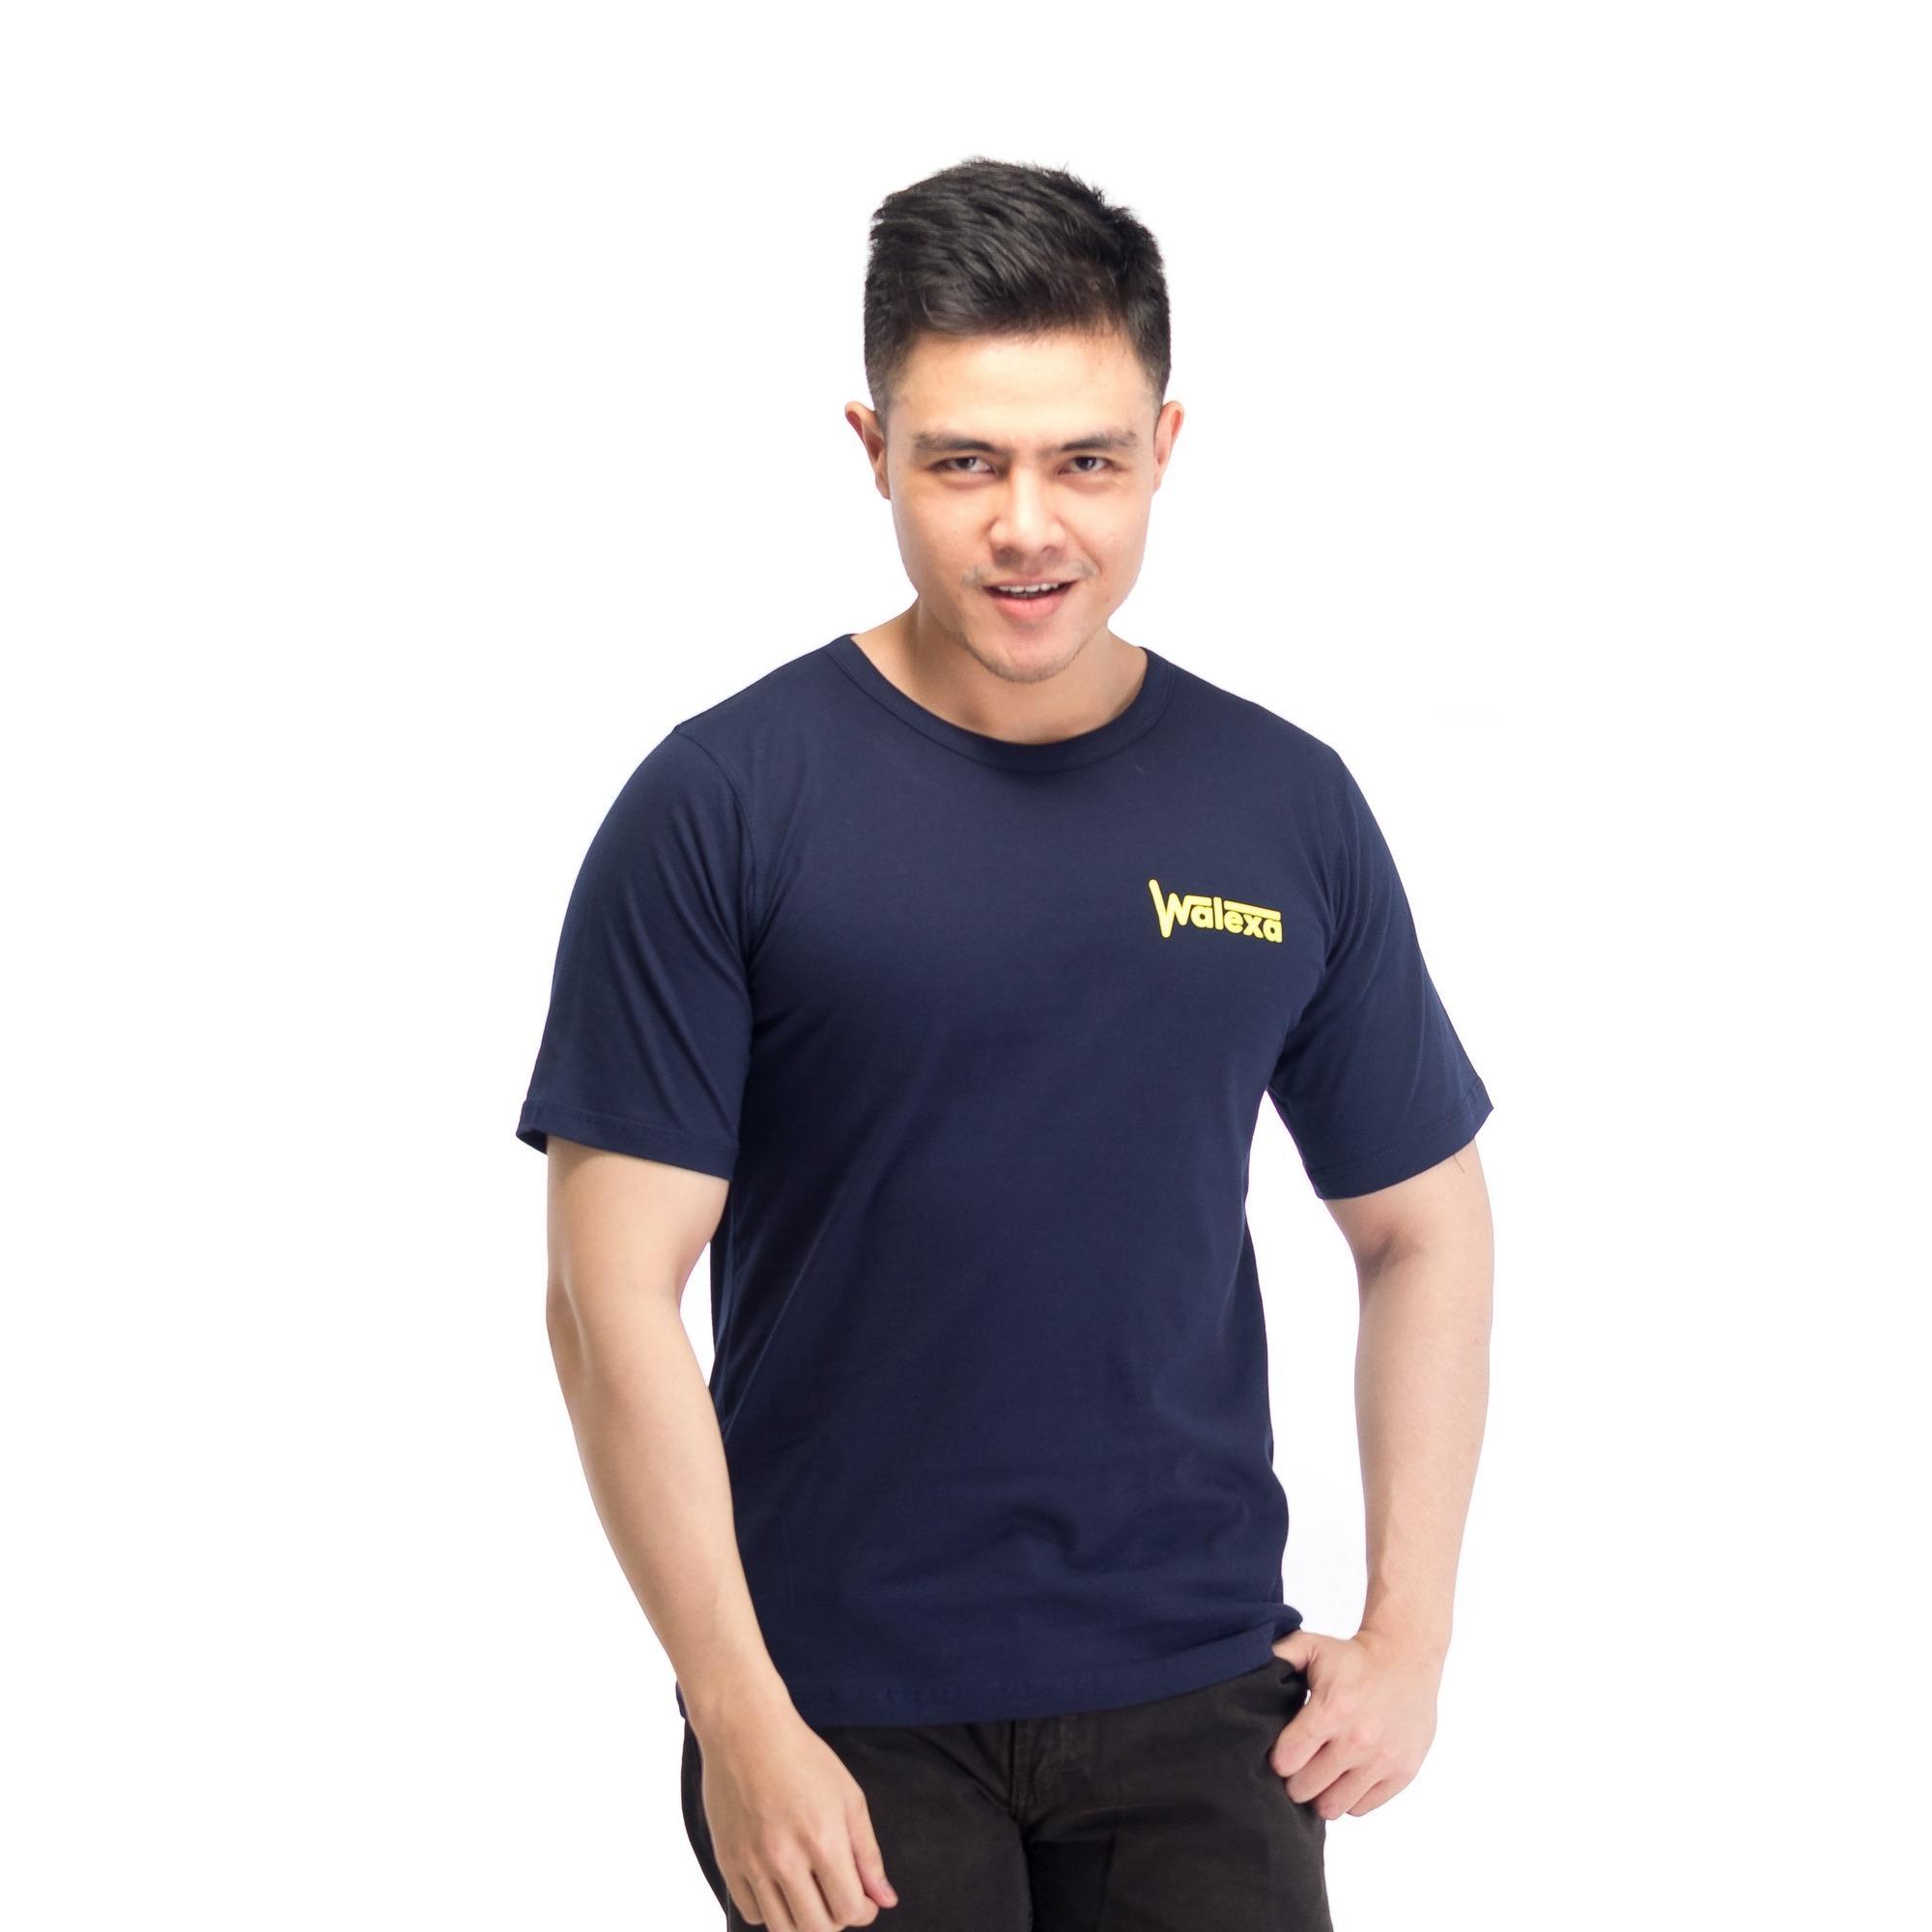 Beli Walexa Original Kaos Distro Kualitas Premium Promo Baju Kaos Murah Walexa Online